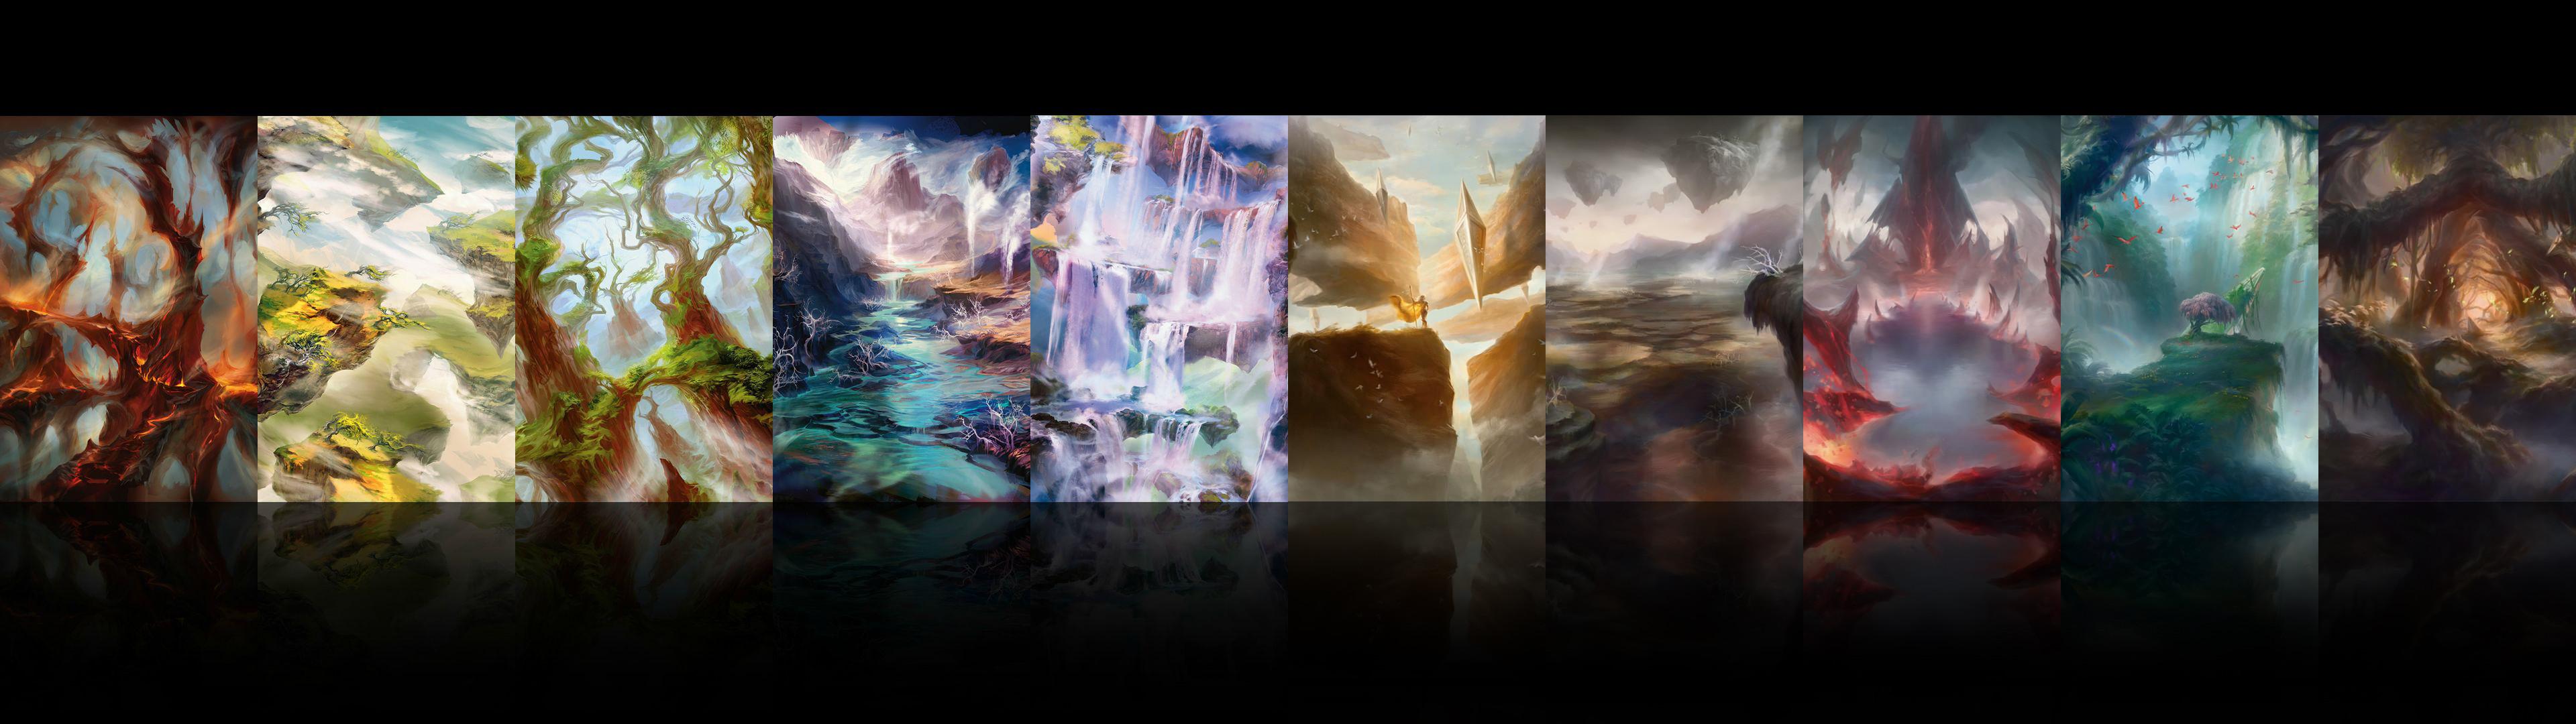 … wallpapers https://i.imgur.com/BmxCVtI.jpg …